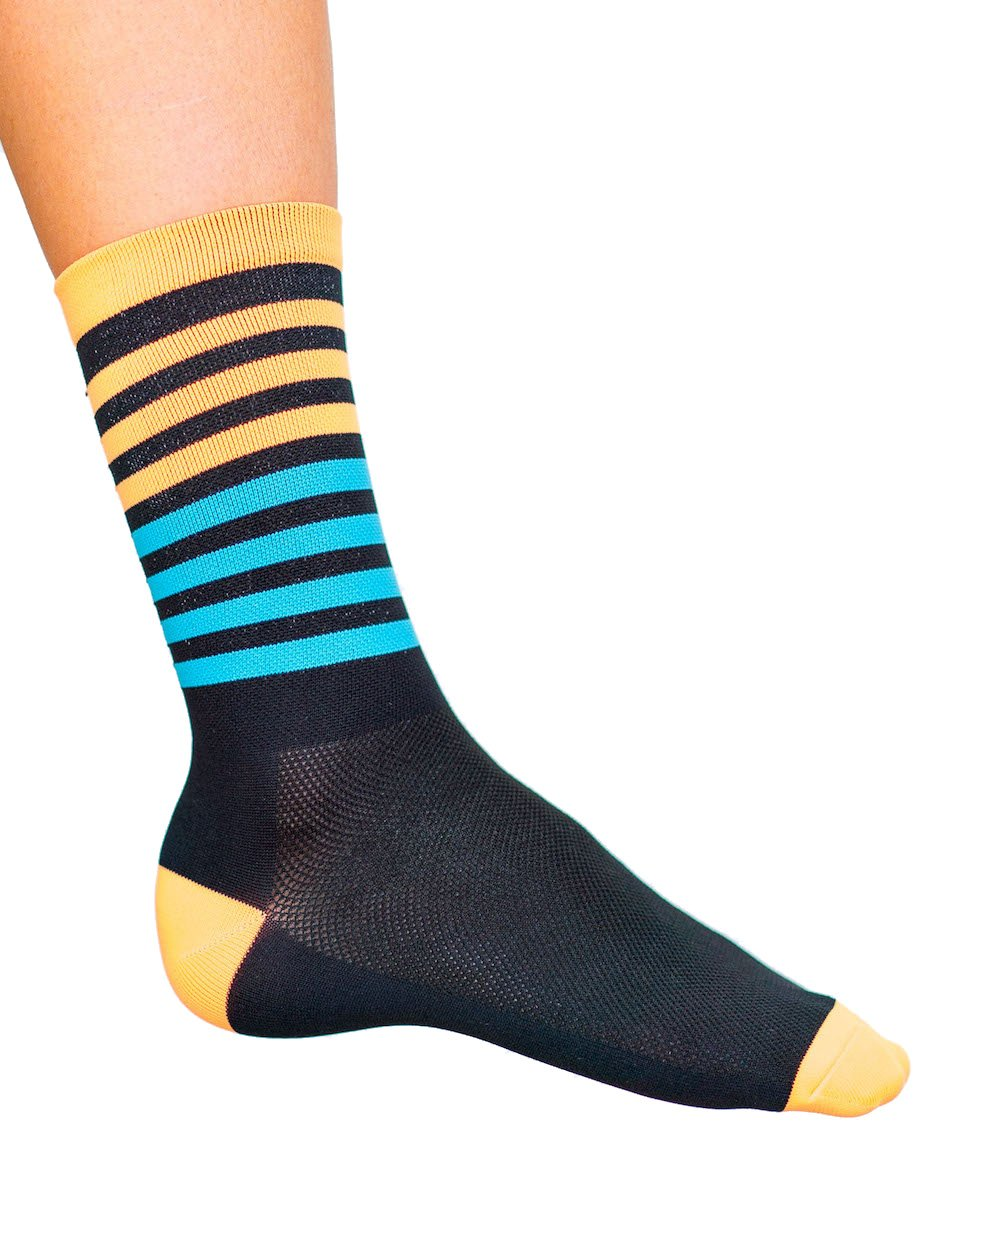 Cosmic Socks 6'' Night Moves, Cycling Socks size 6-11